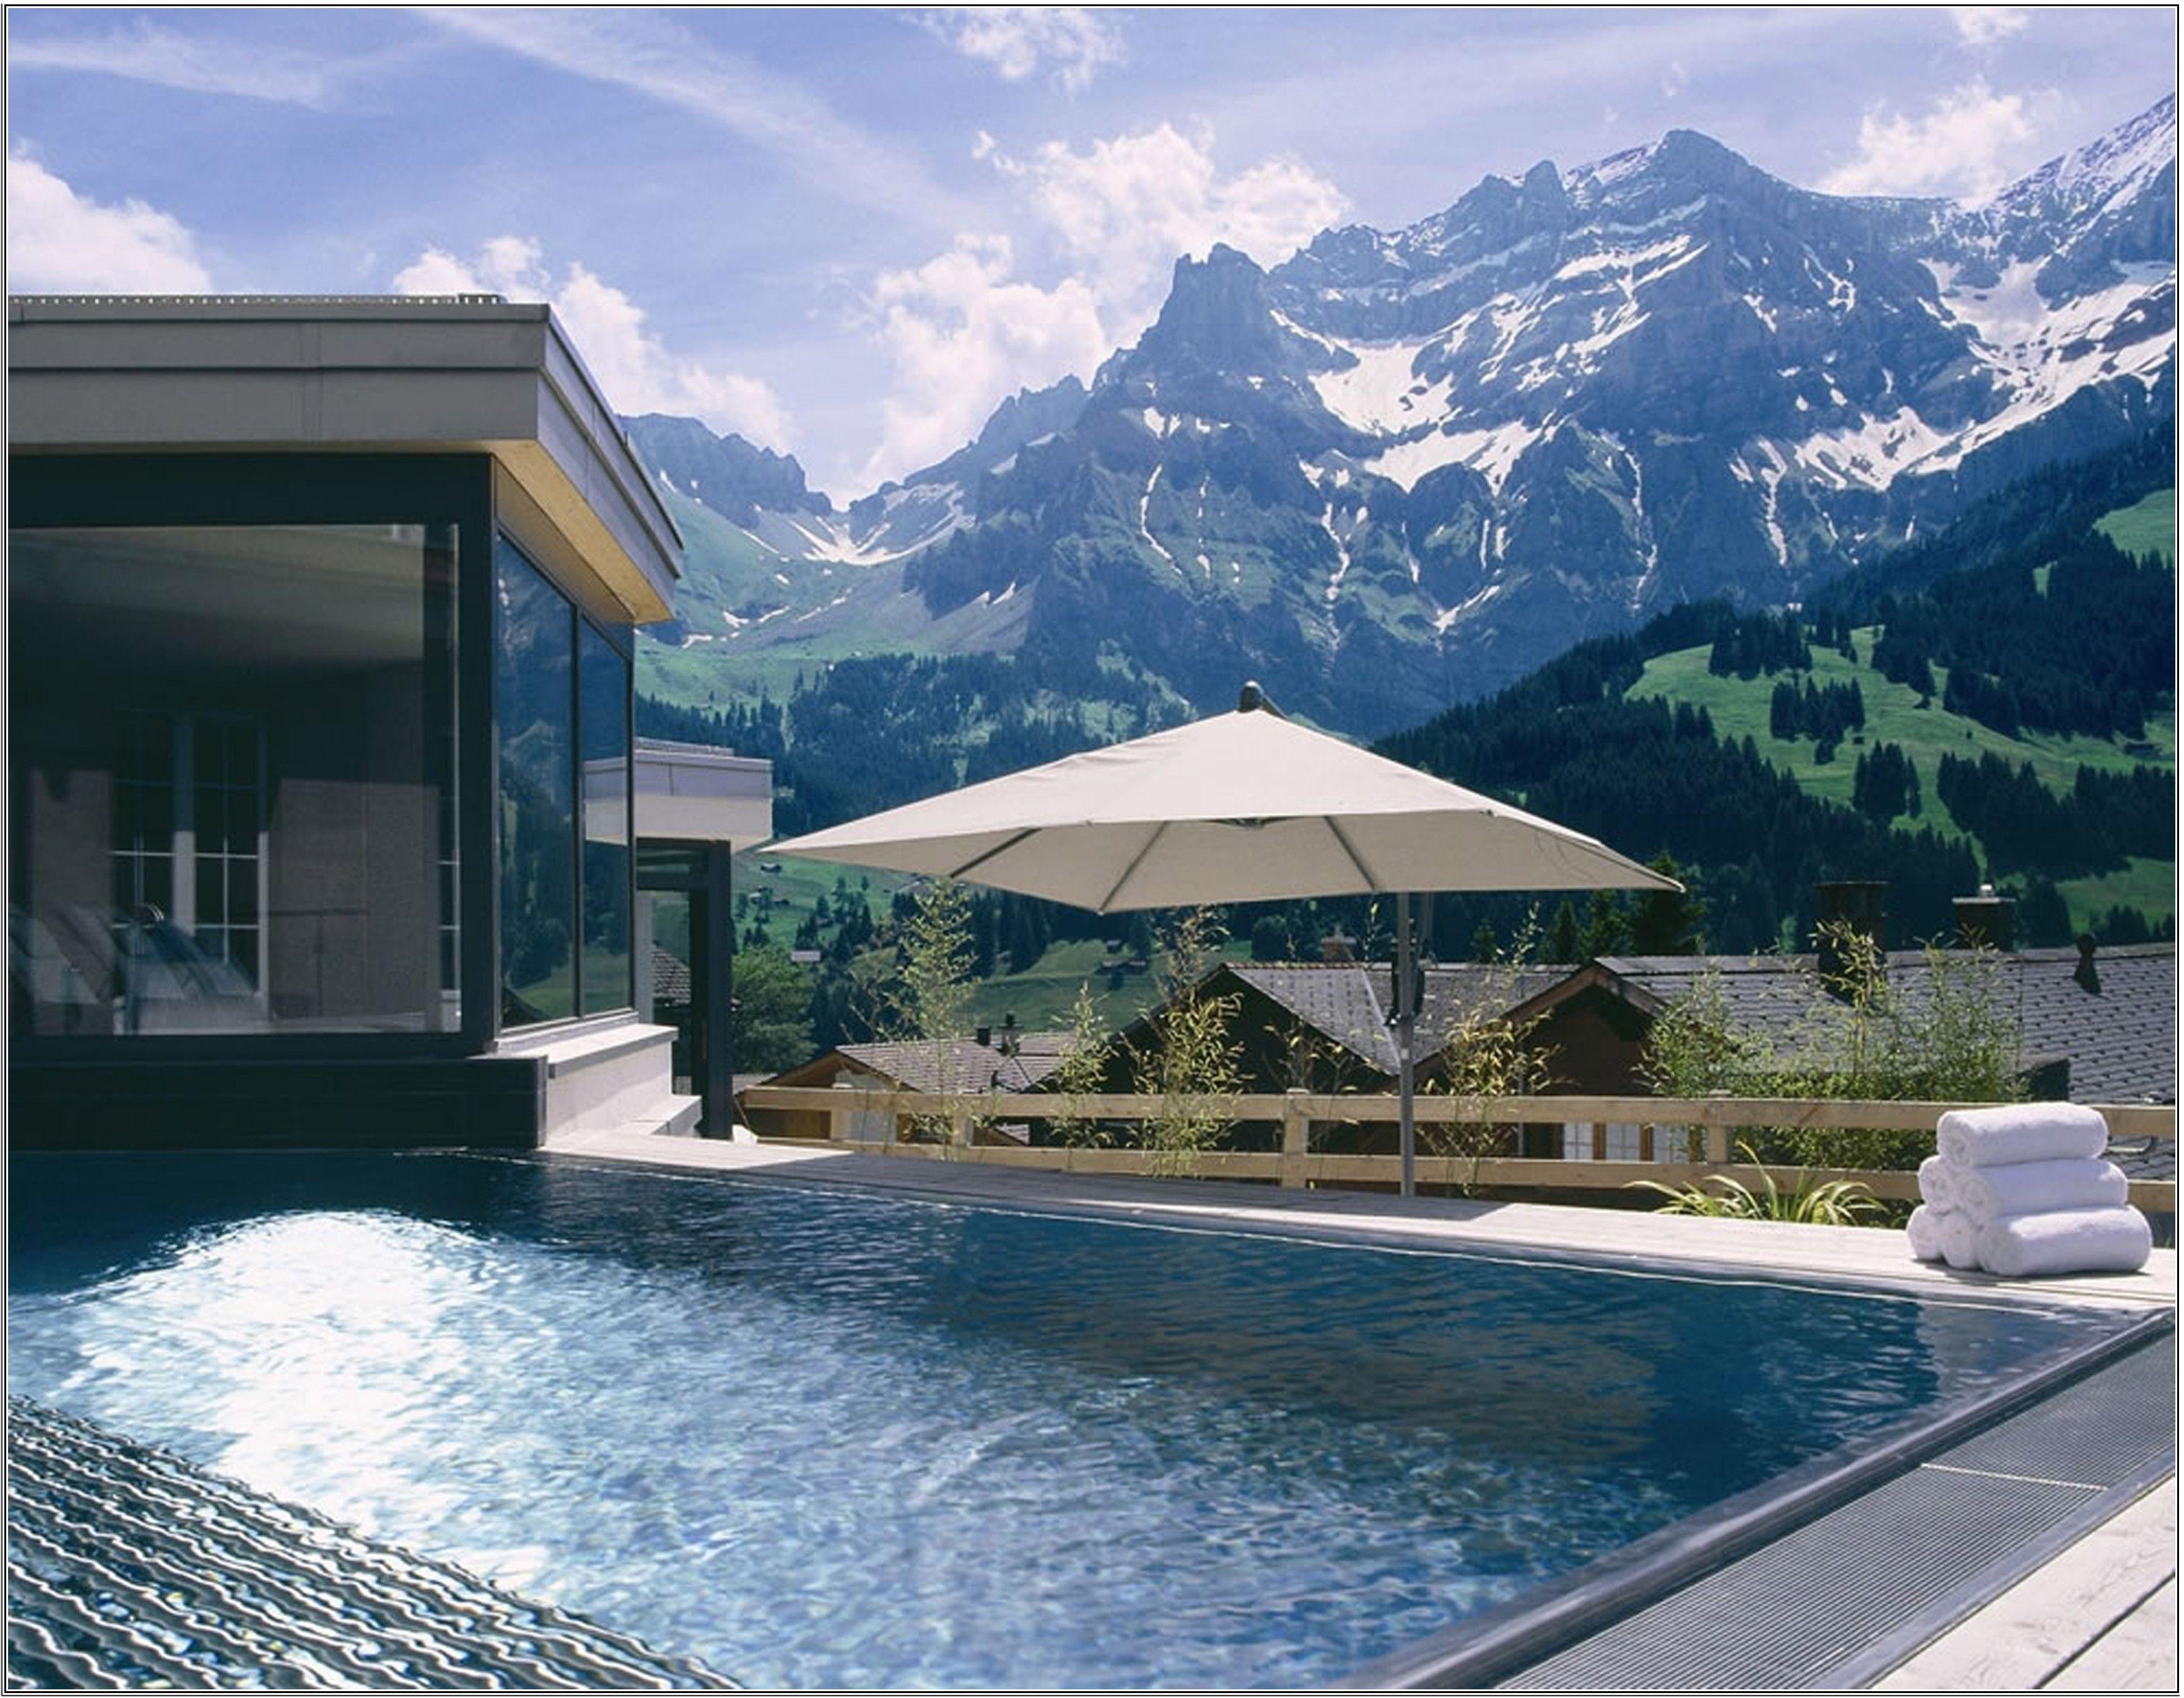 Best Hotel In Switzerland With Infinity Pool Awesome Cambrian Hotel In Switzerland With Exquisite Infinity Pool Hotels Pools Vintage Home De Hotels With Infinity Pools Amazing Swimming Pools Pool Designs